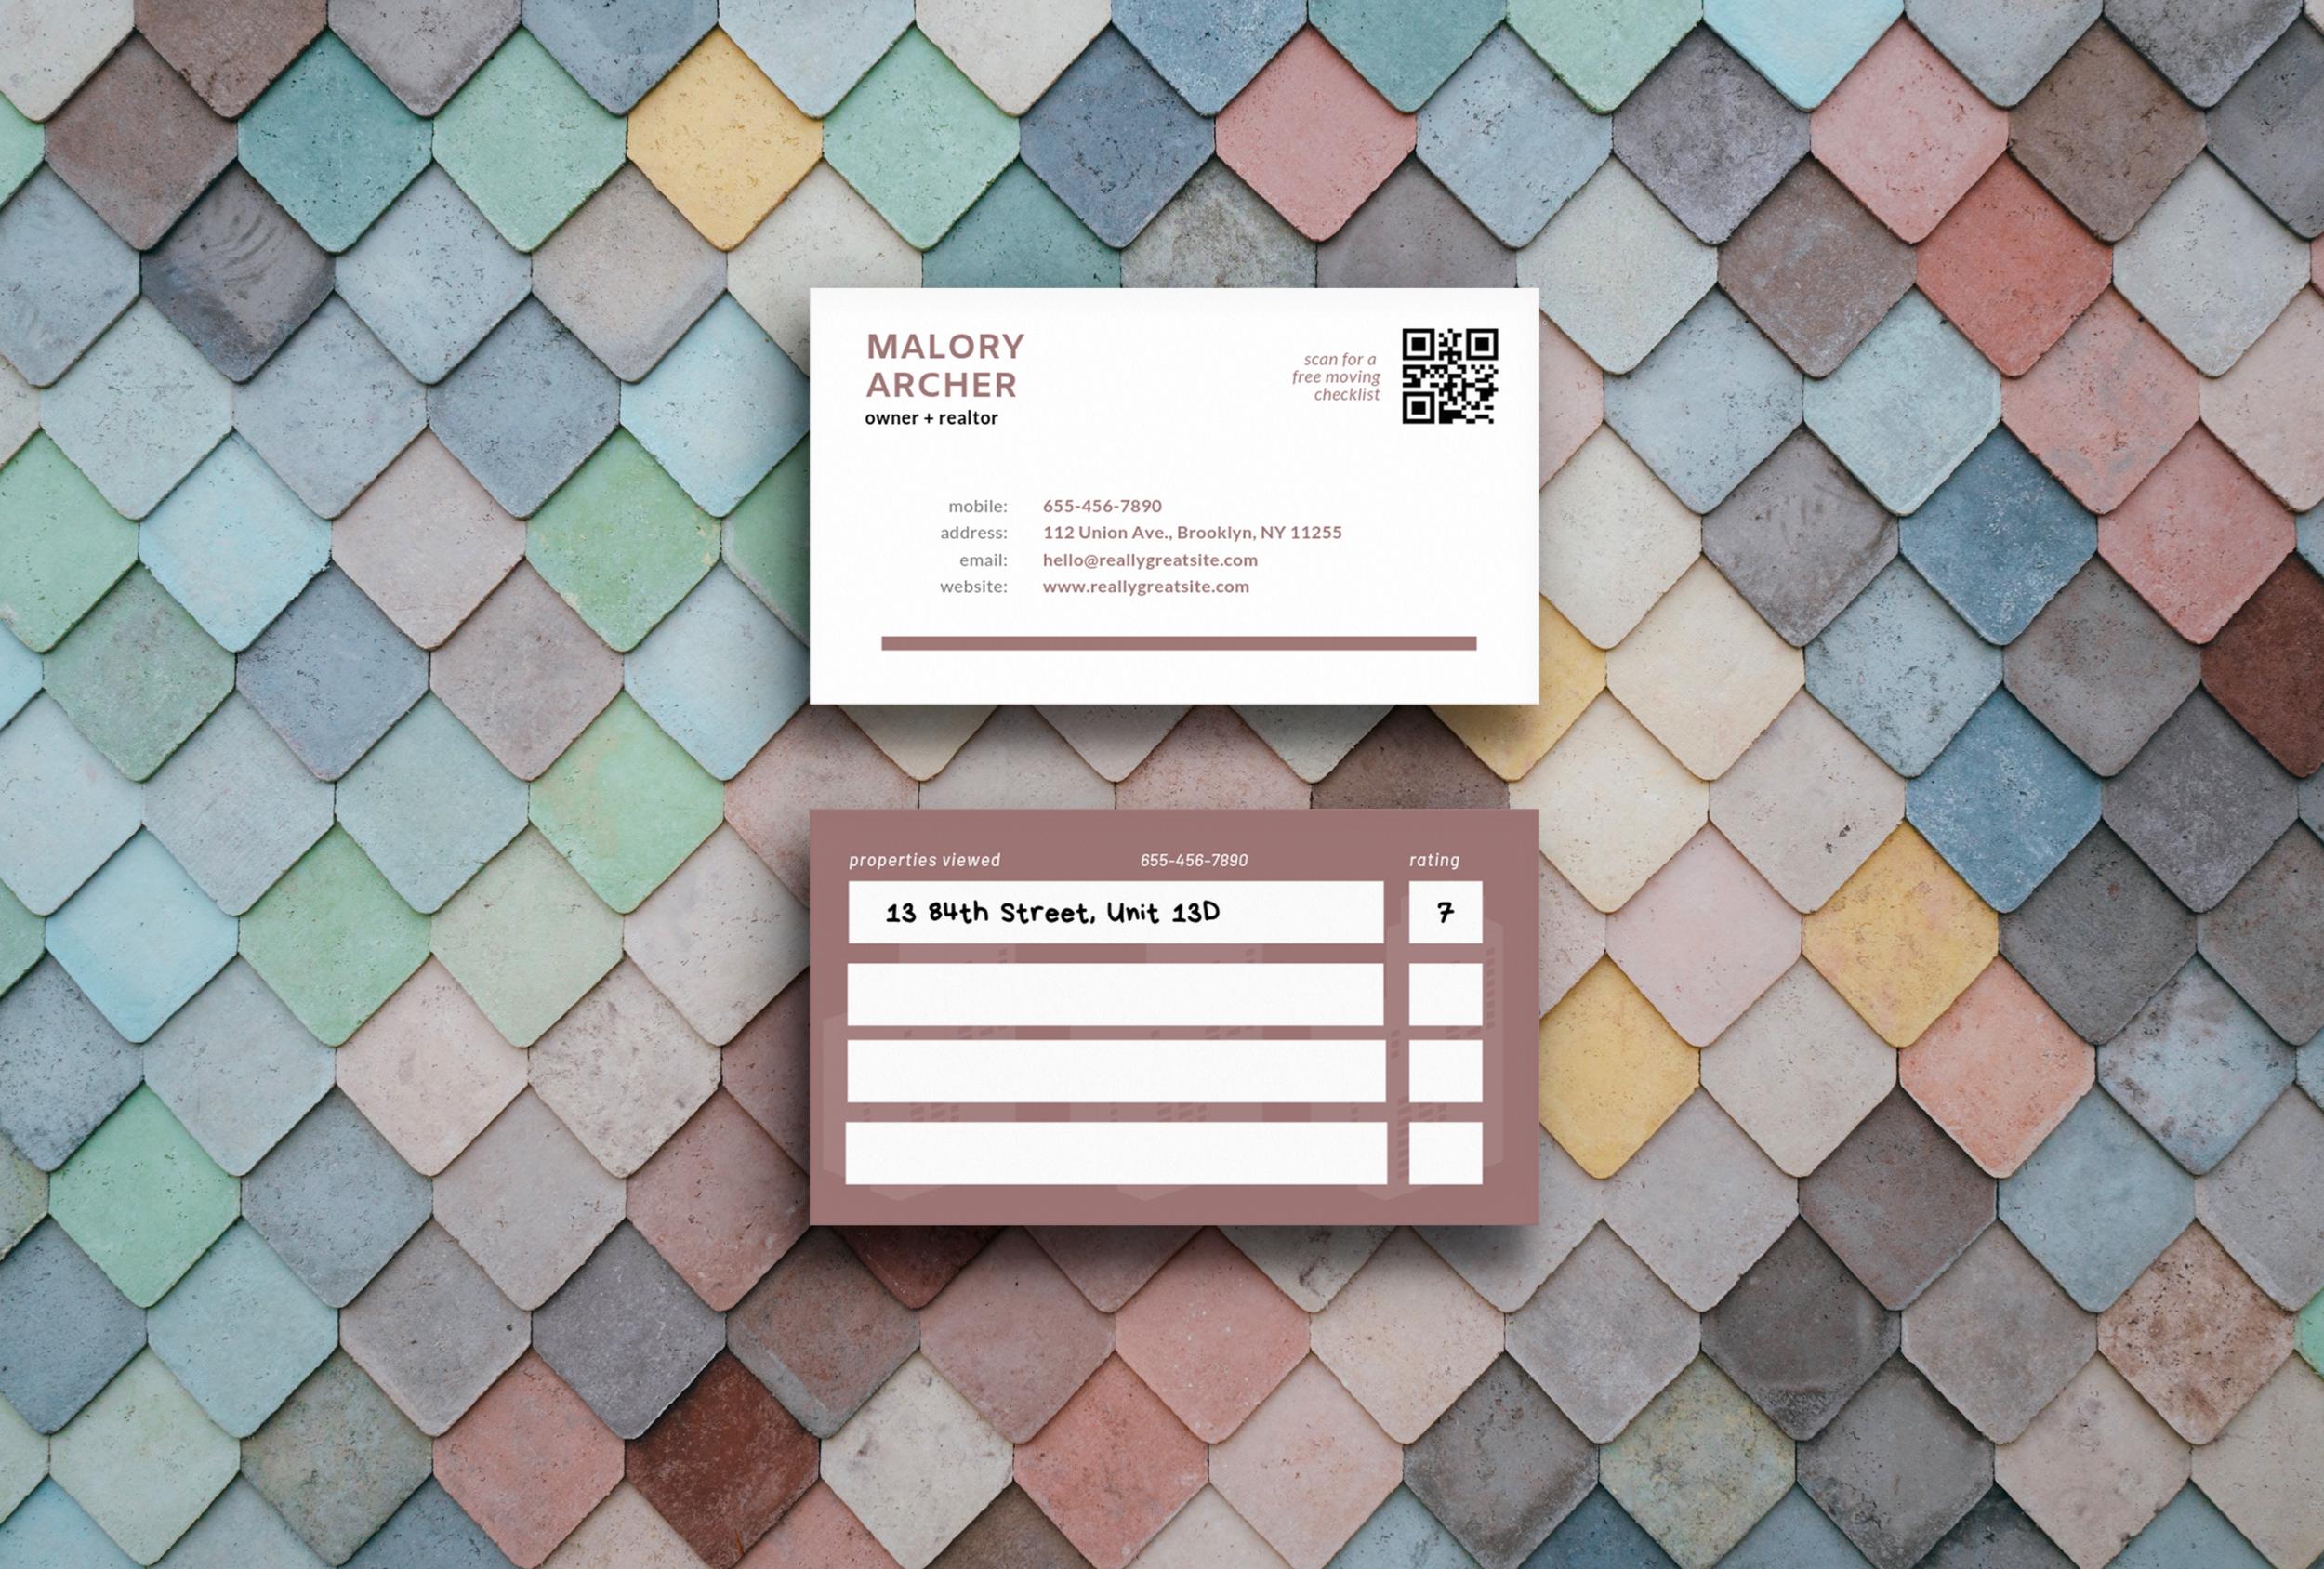 Archer Realty - Branding / Business Cards / Web Design